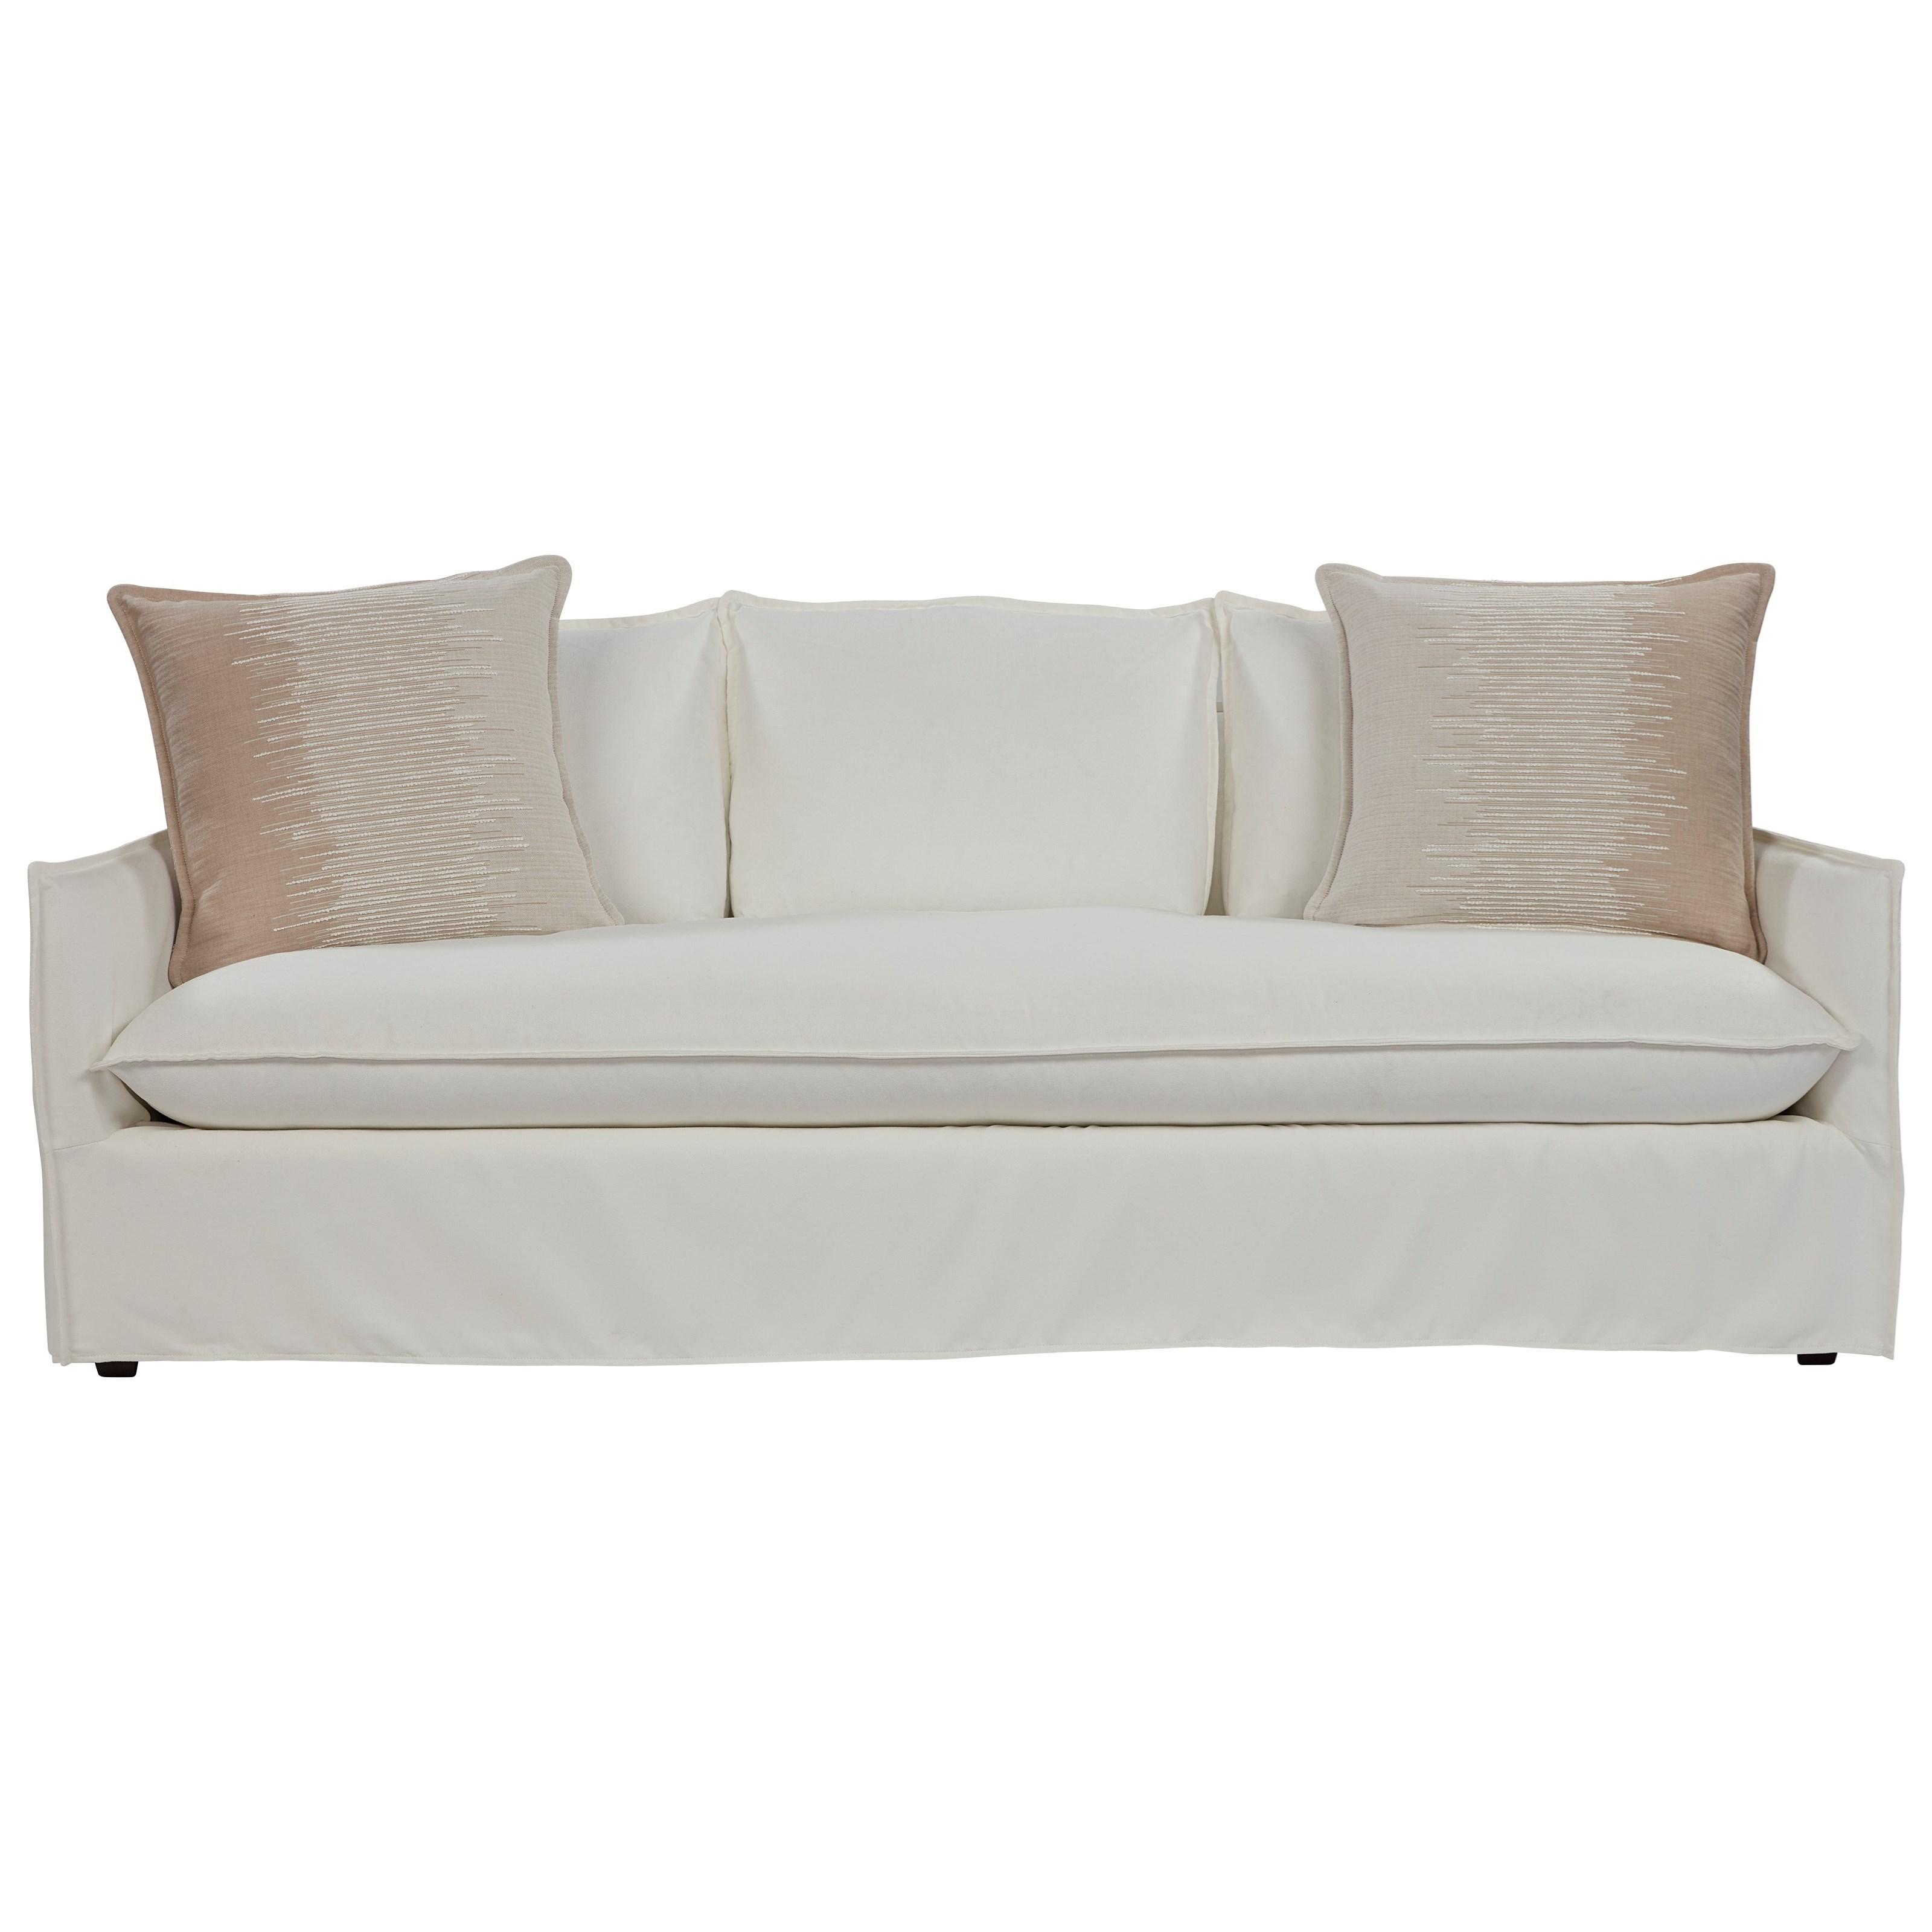 Coastal Living Home - Getaway Siesta Key Sofa -Super Salt by Universal at Baer's Furniture